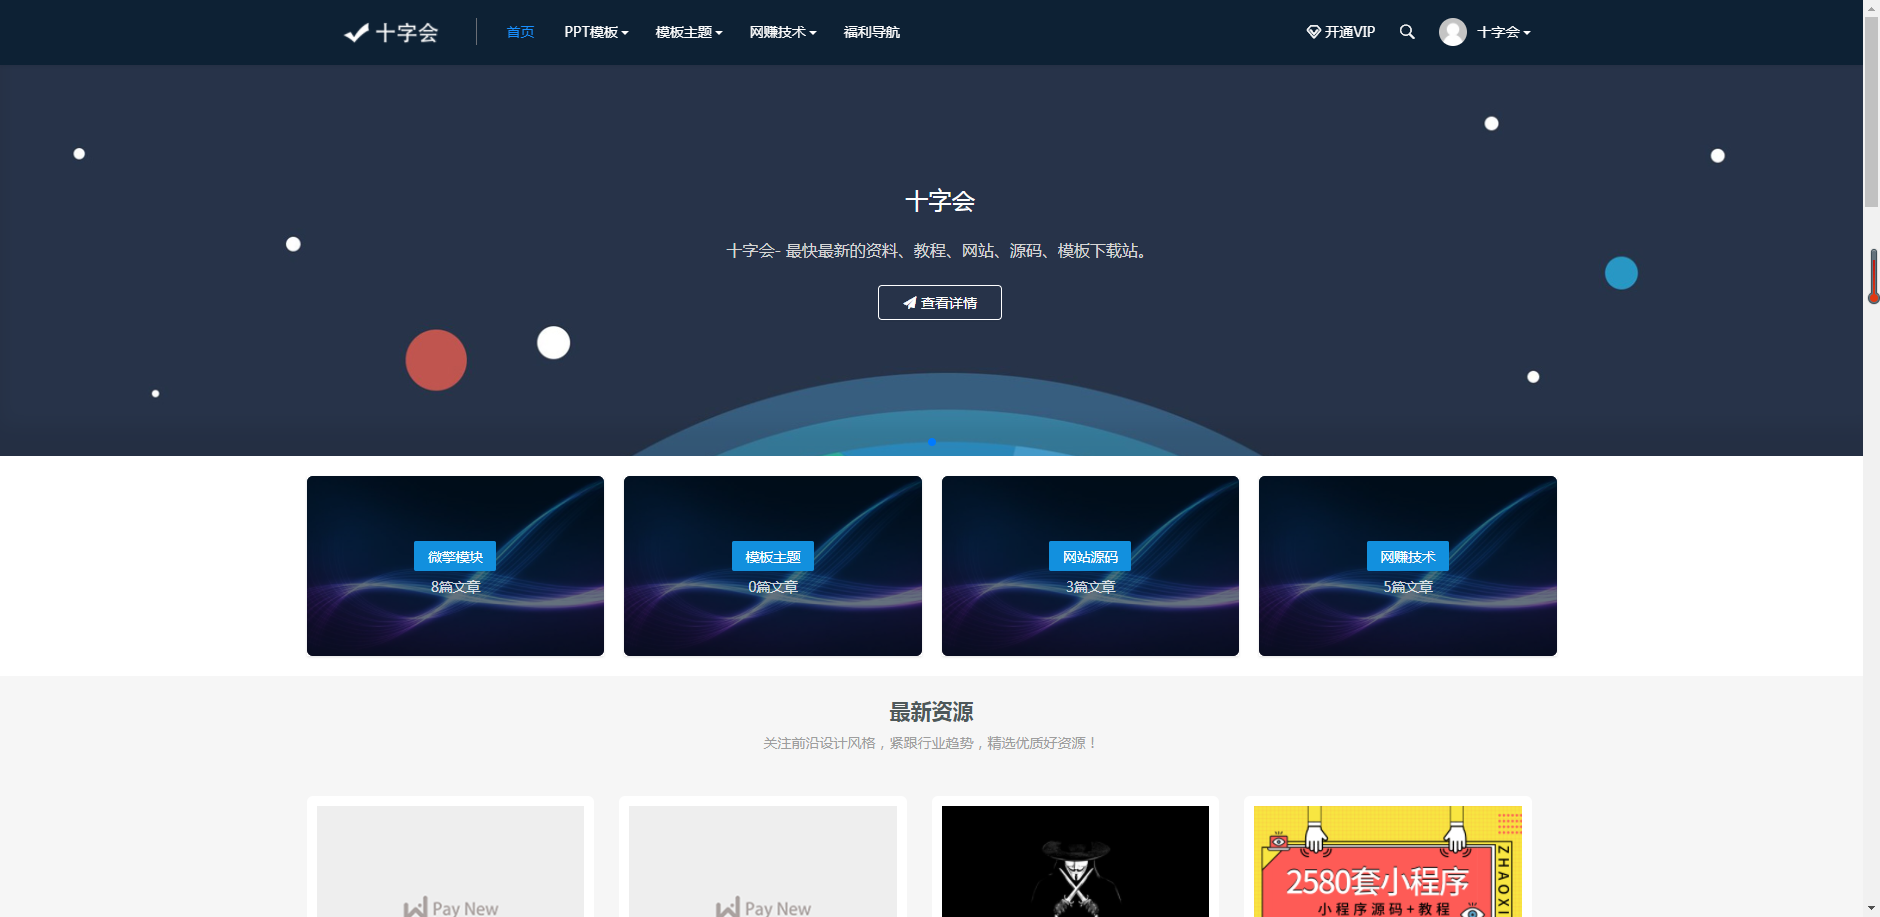 Wordpress博客主题 虚拟资源付费下载类主题:日主题Rizhuti 3.3最新版下载